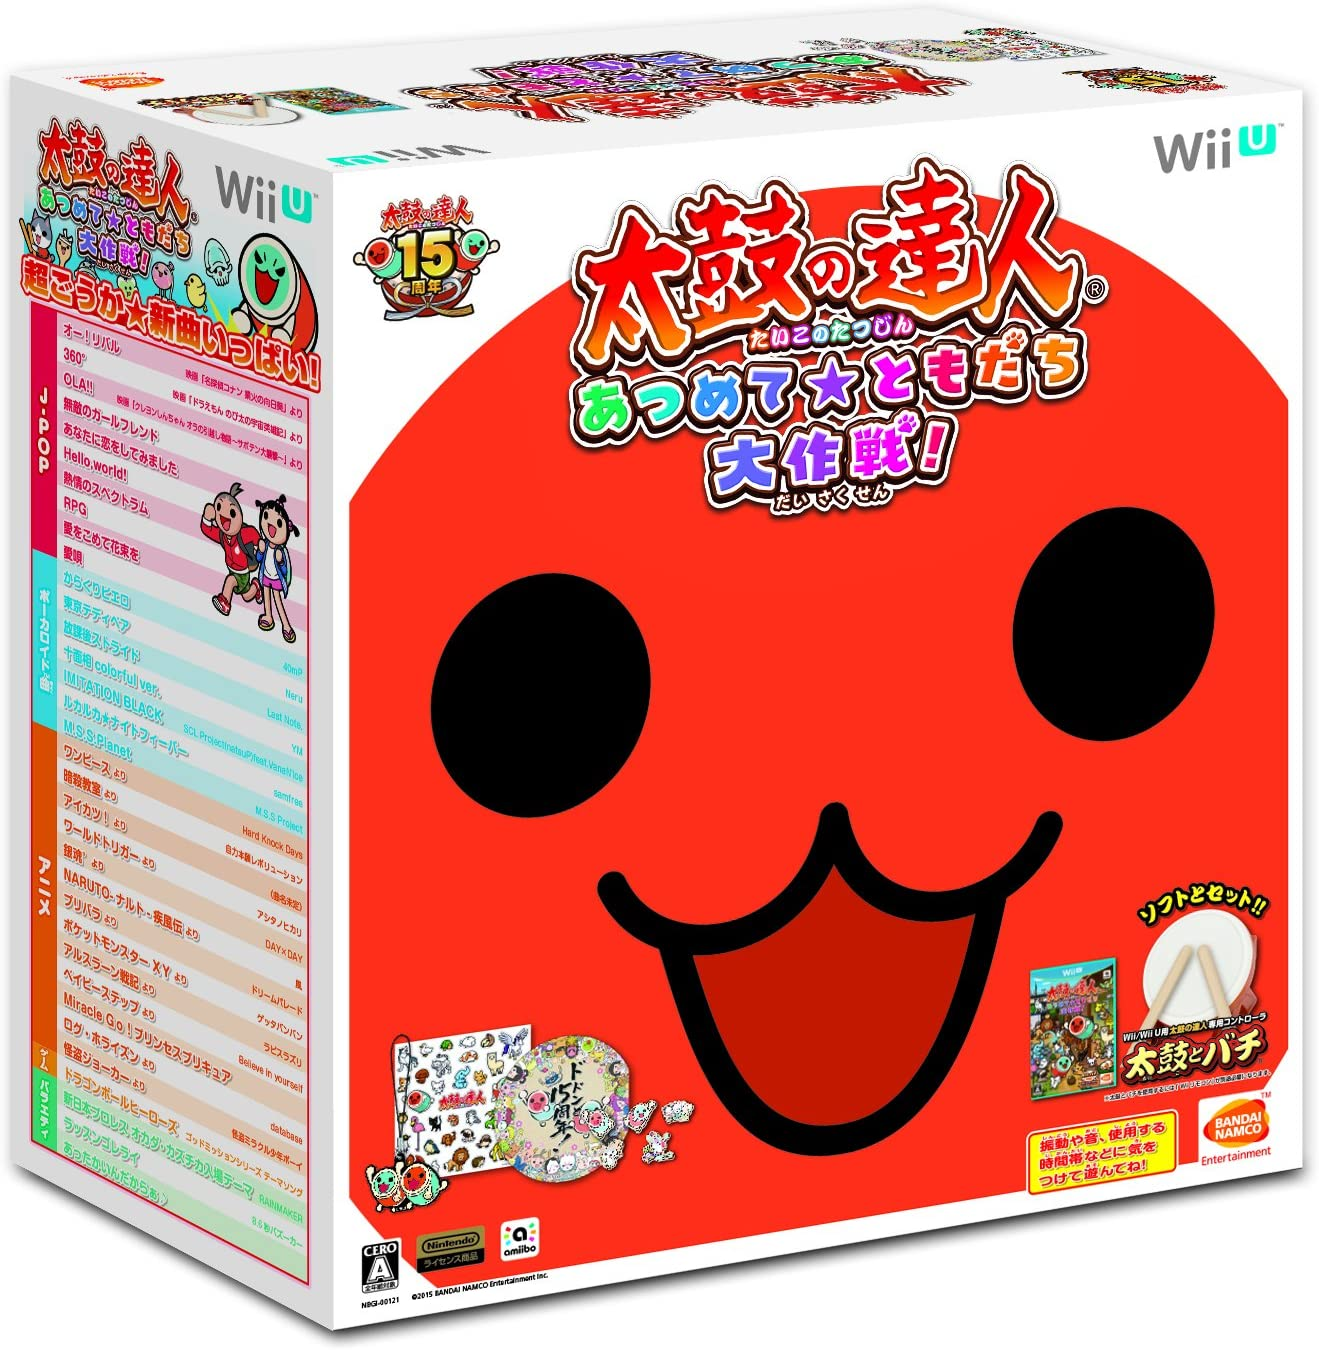 Taiko no Tatsujin Tokumori! Atsumete Tomodachi Daisakusen! Drum Controller Set [Wii U][Importación Japonesa]: Amazon.es: Videojuegos